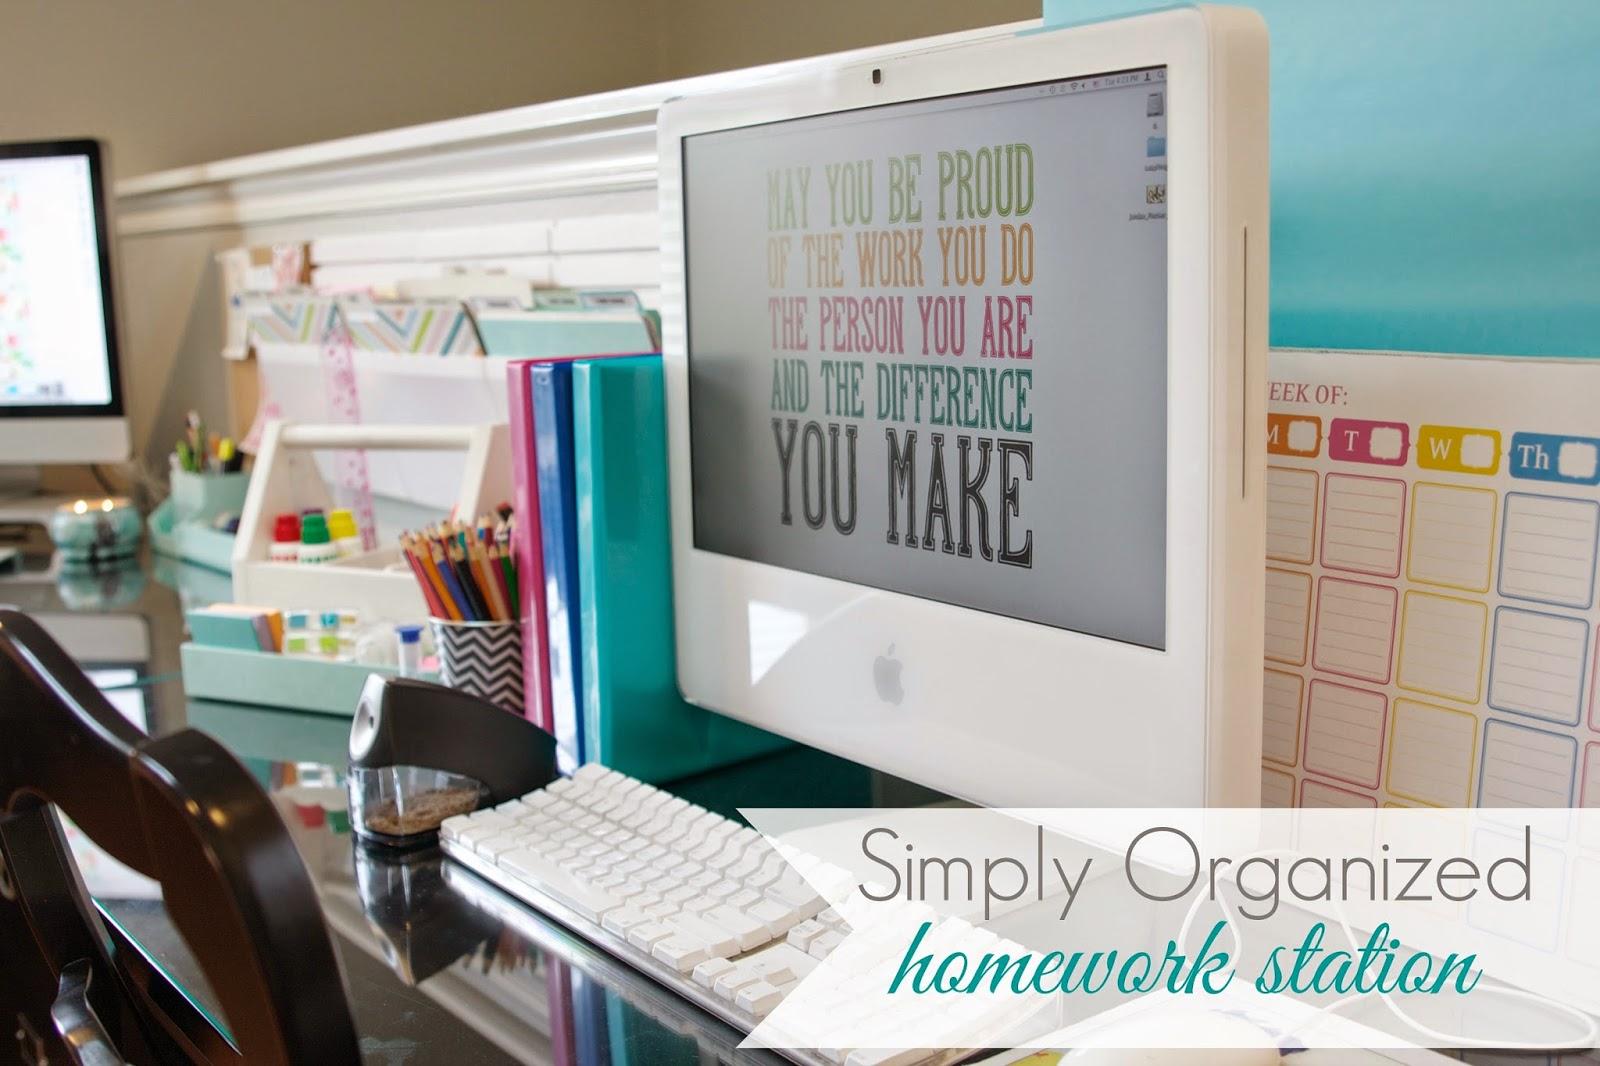 Organized Homework Station